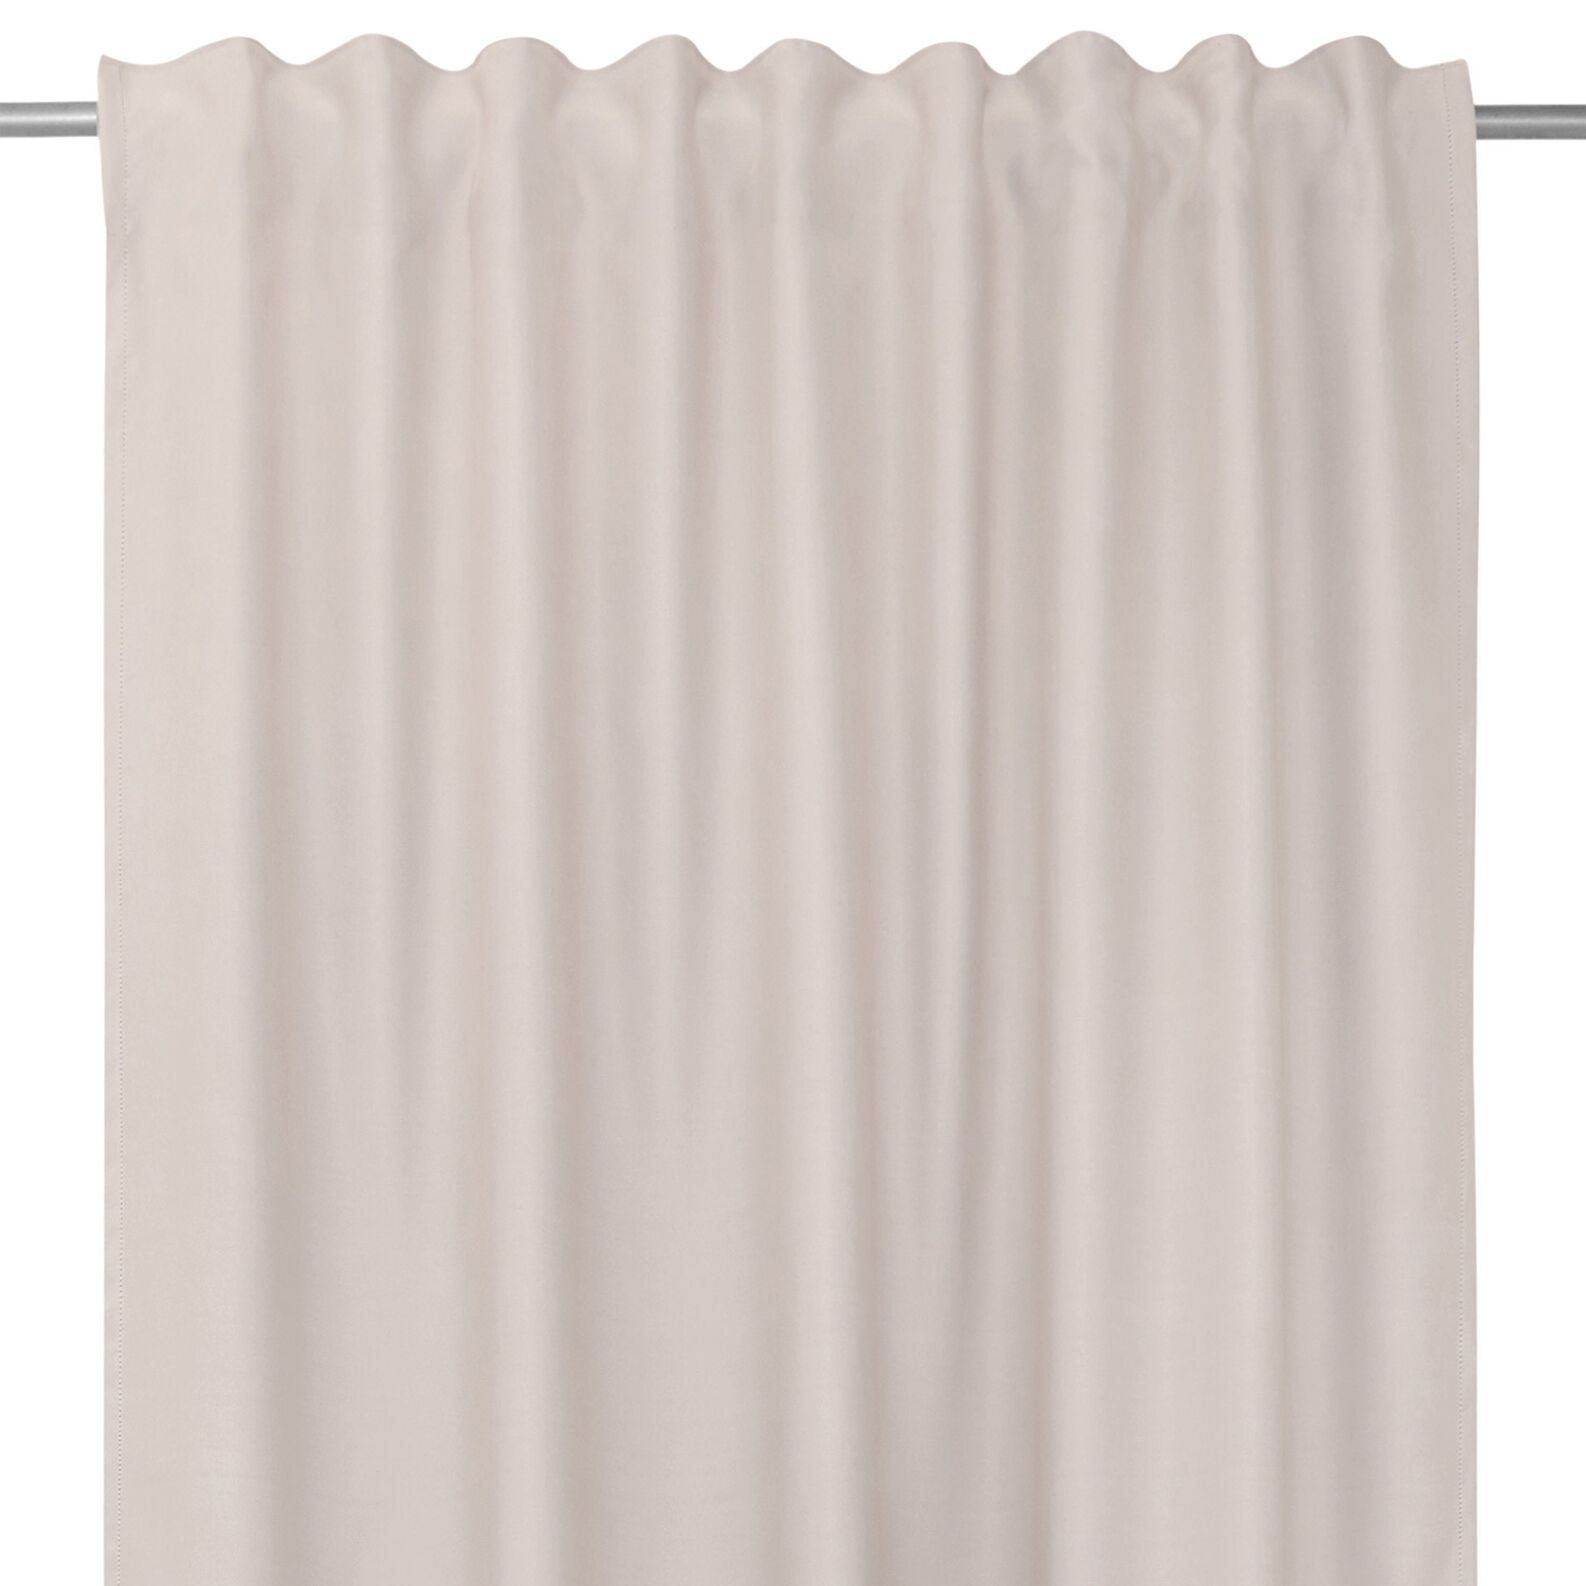 Soft curtain with hidden tabs